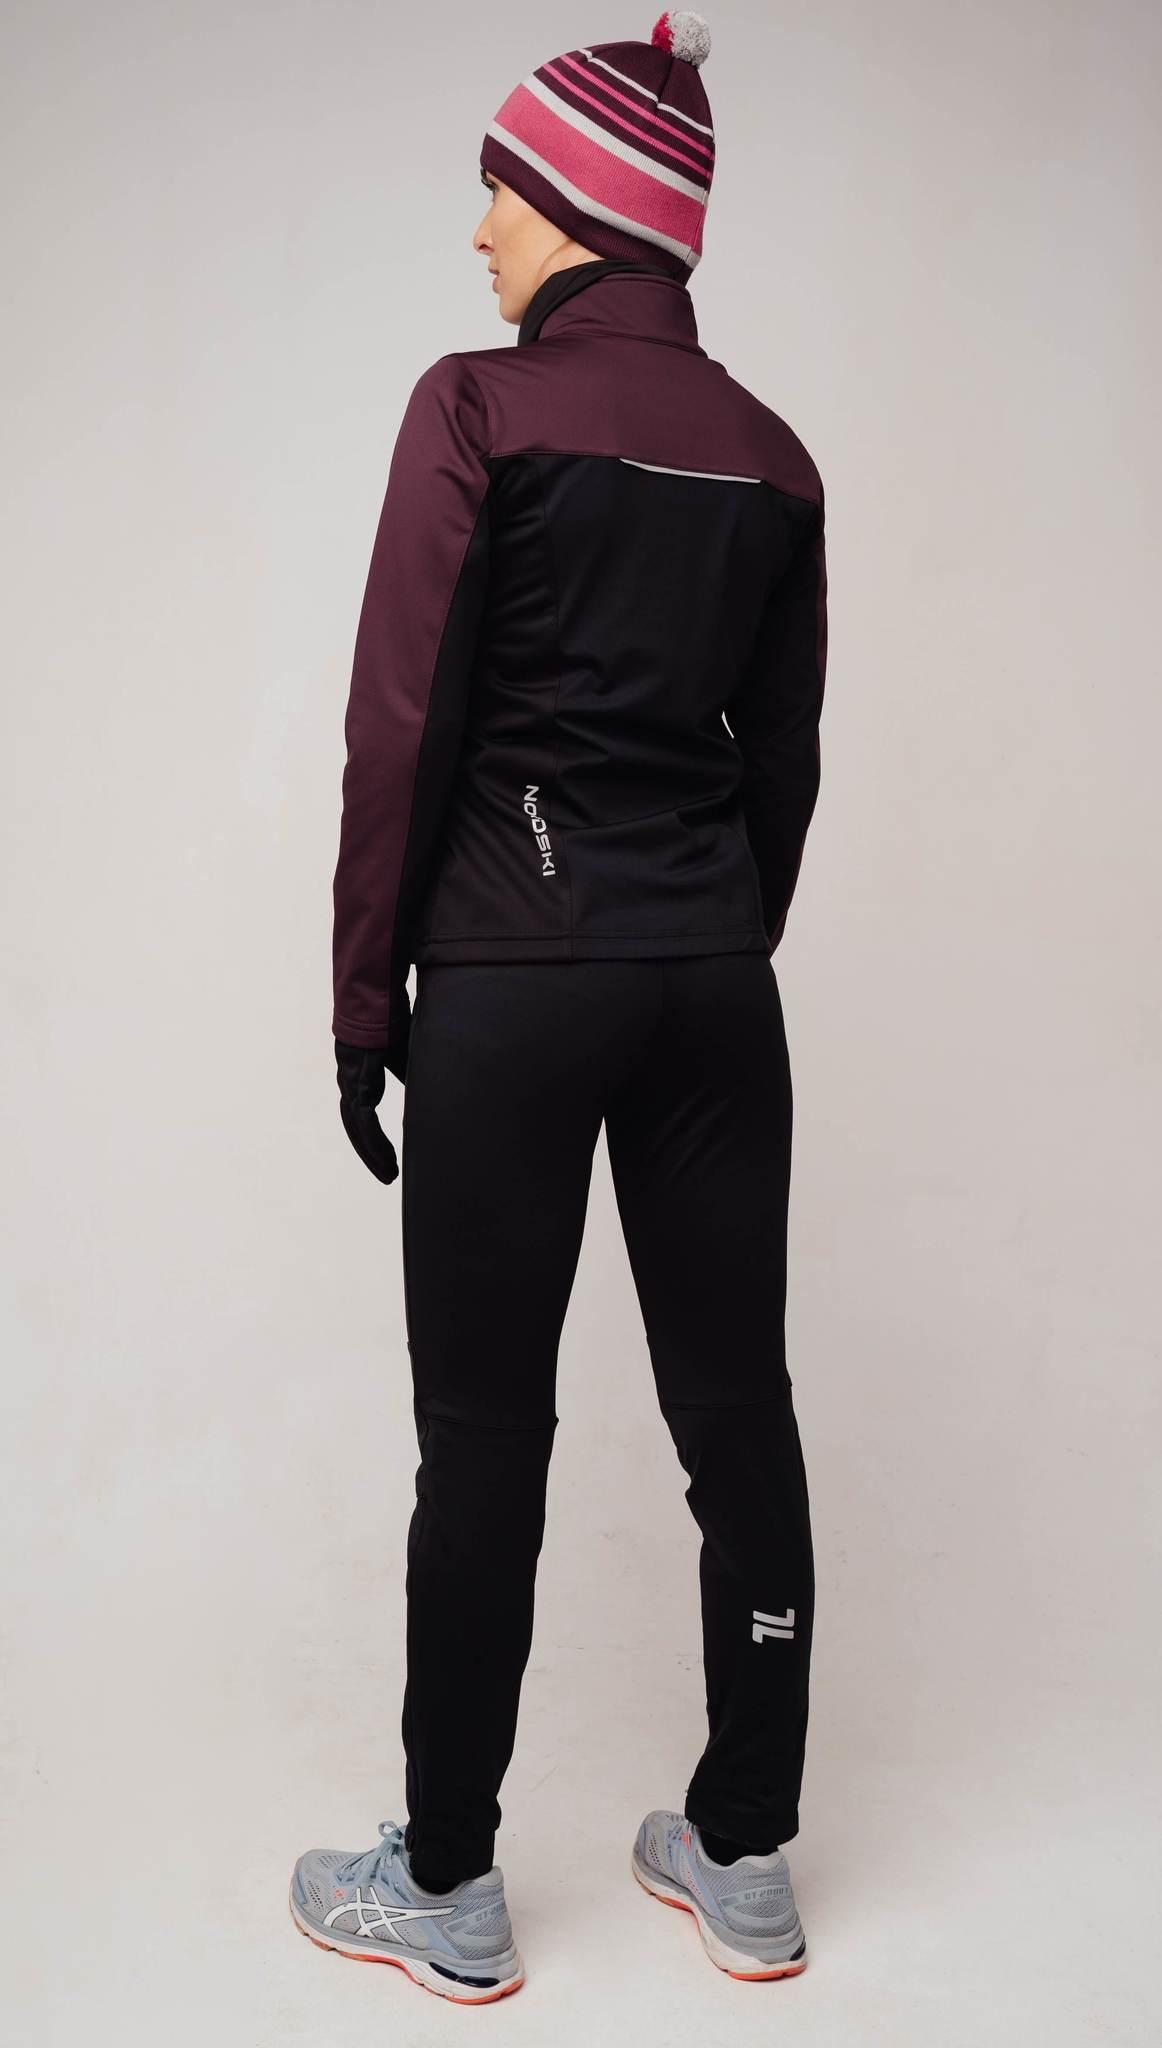 Nordski Active Base женский беговой костюм purple - 2